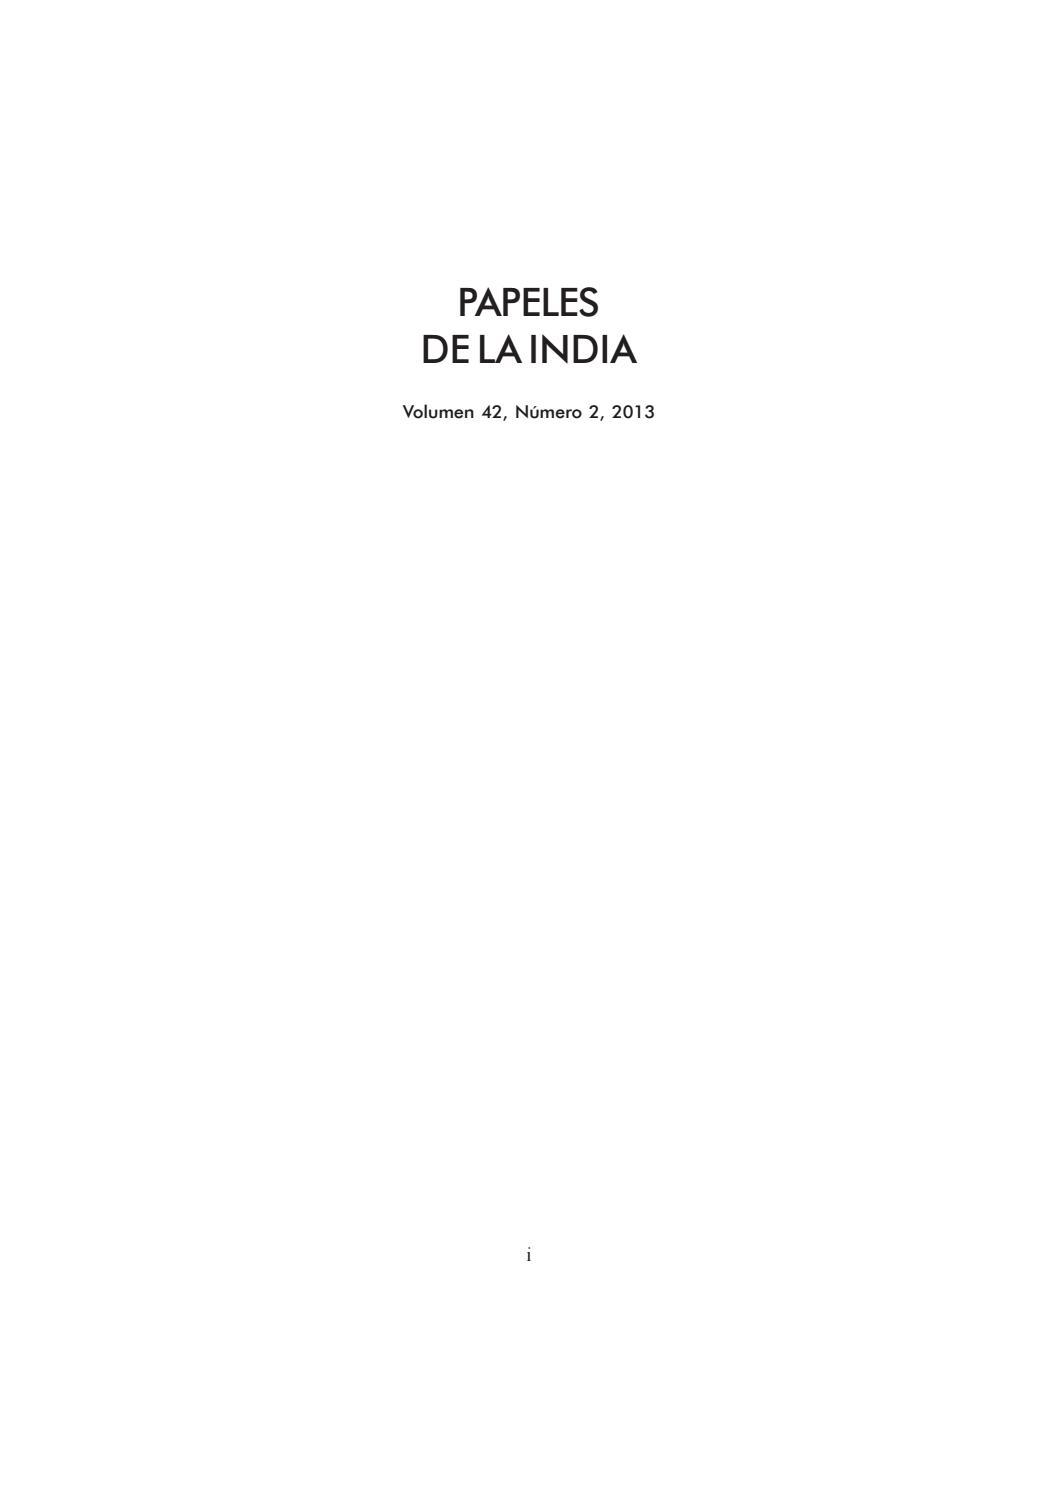 Papeles vol 42 2 2013 by Subhas USC - issuu